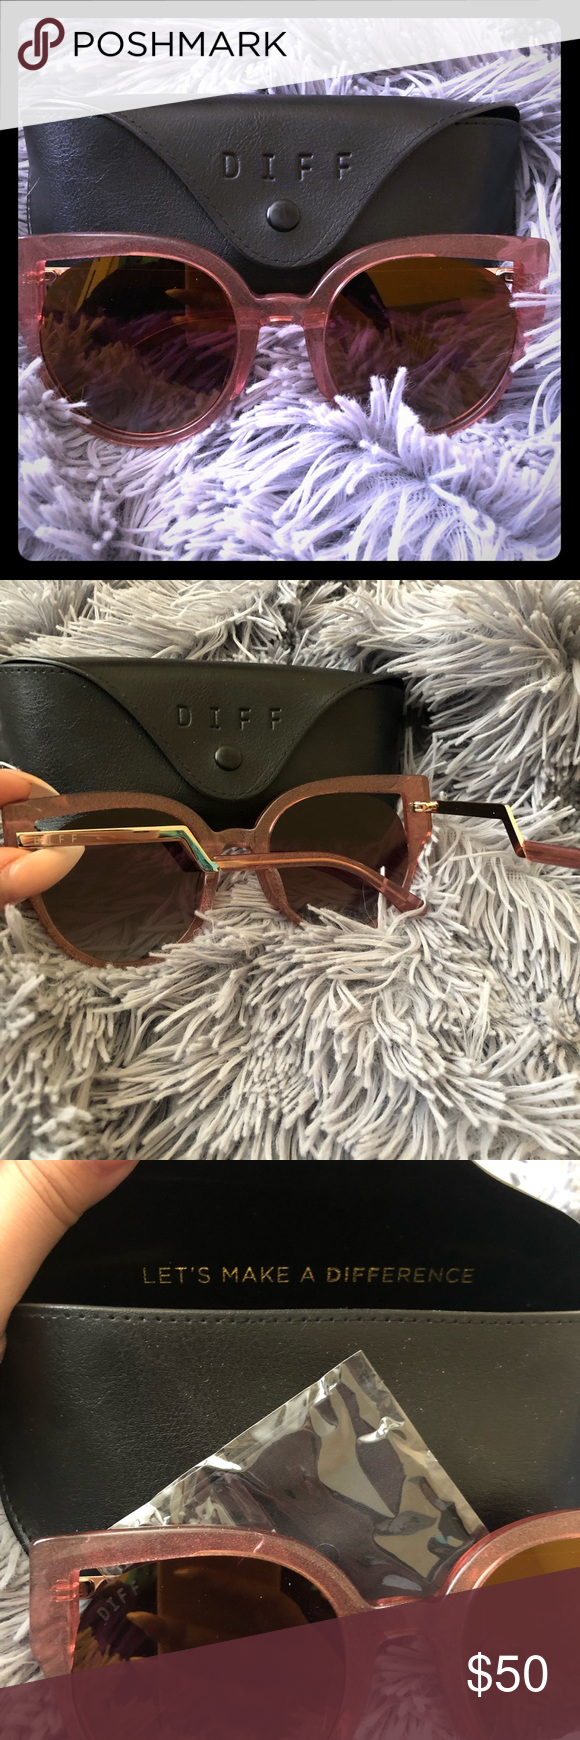 20d19dcde9412 Diff eyewear sunglasses ✨✨ Brand new